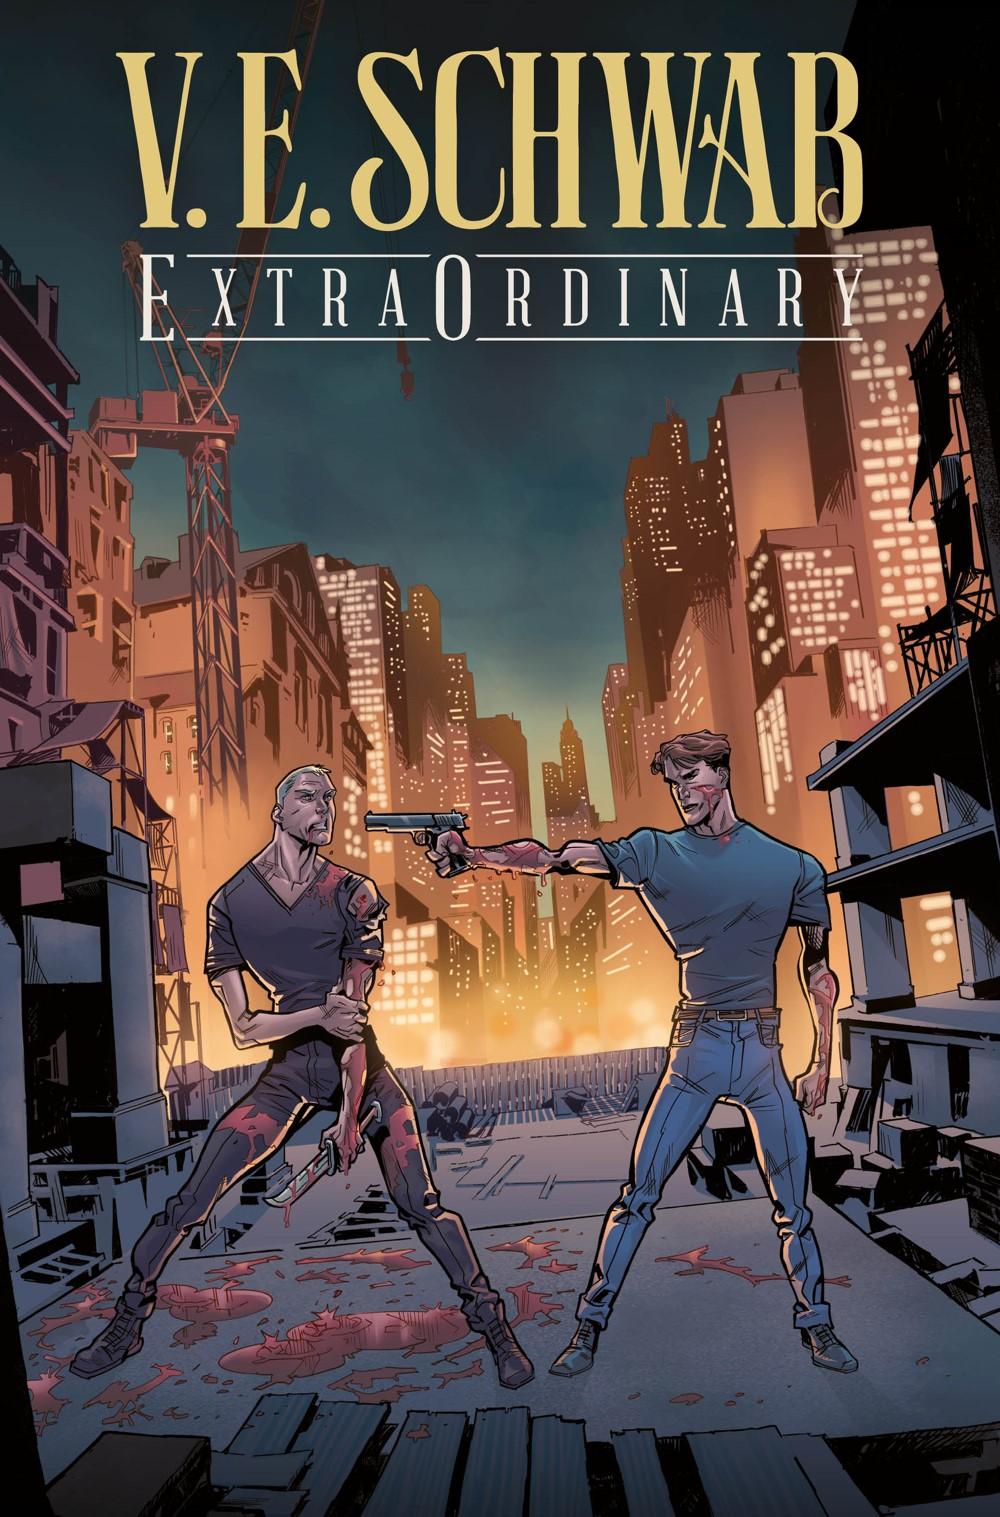 ExtraOrdinary1__Collectors-Pack-Exclusive ComicList Previews: EXTRAORDINARY #1